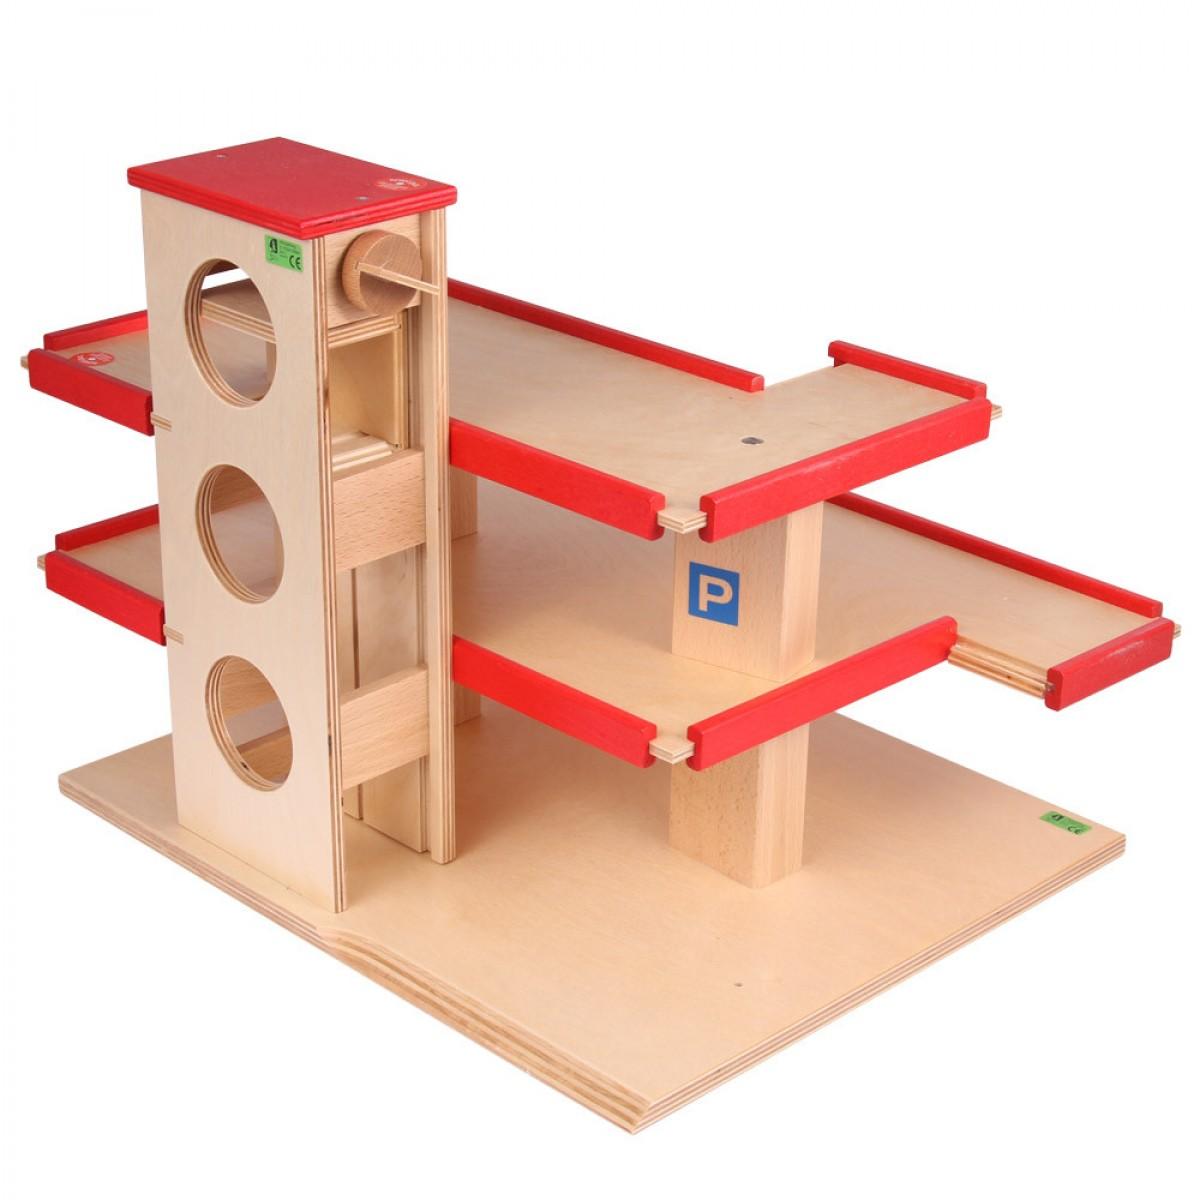 Beck parkhaus mit roter umrandung holzspielzeug profi